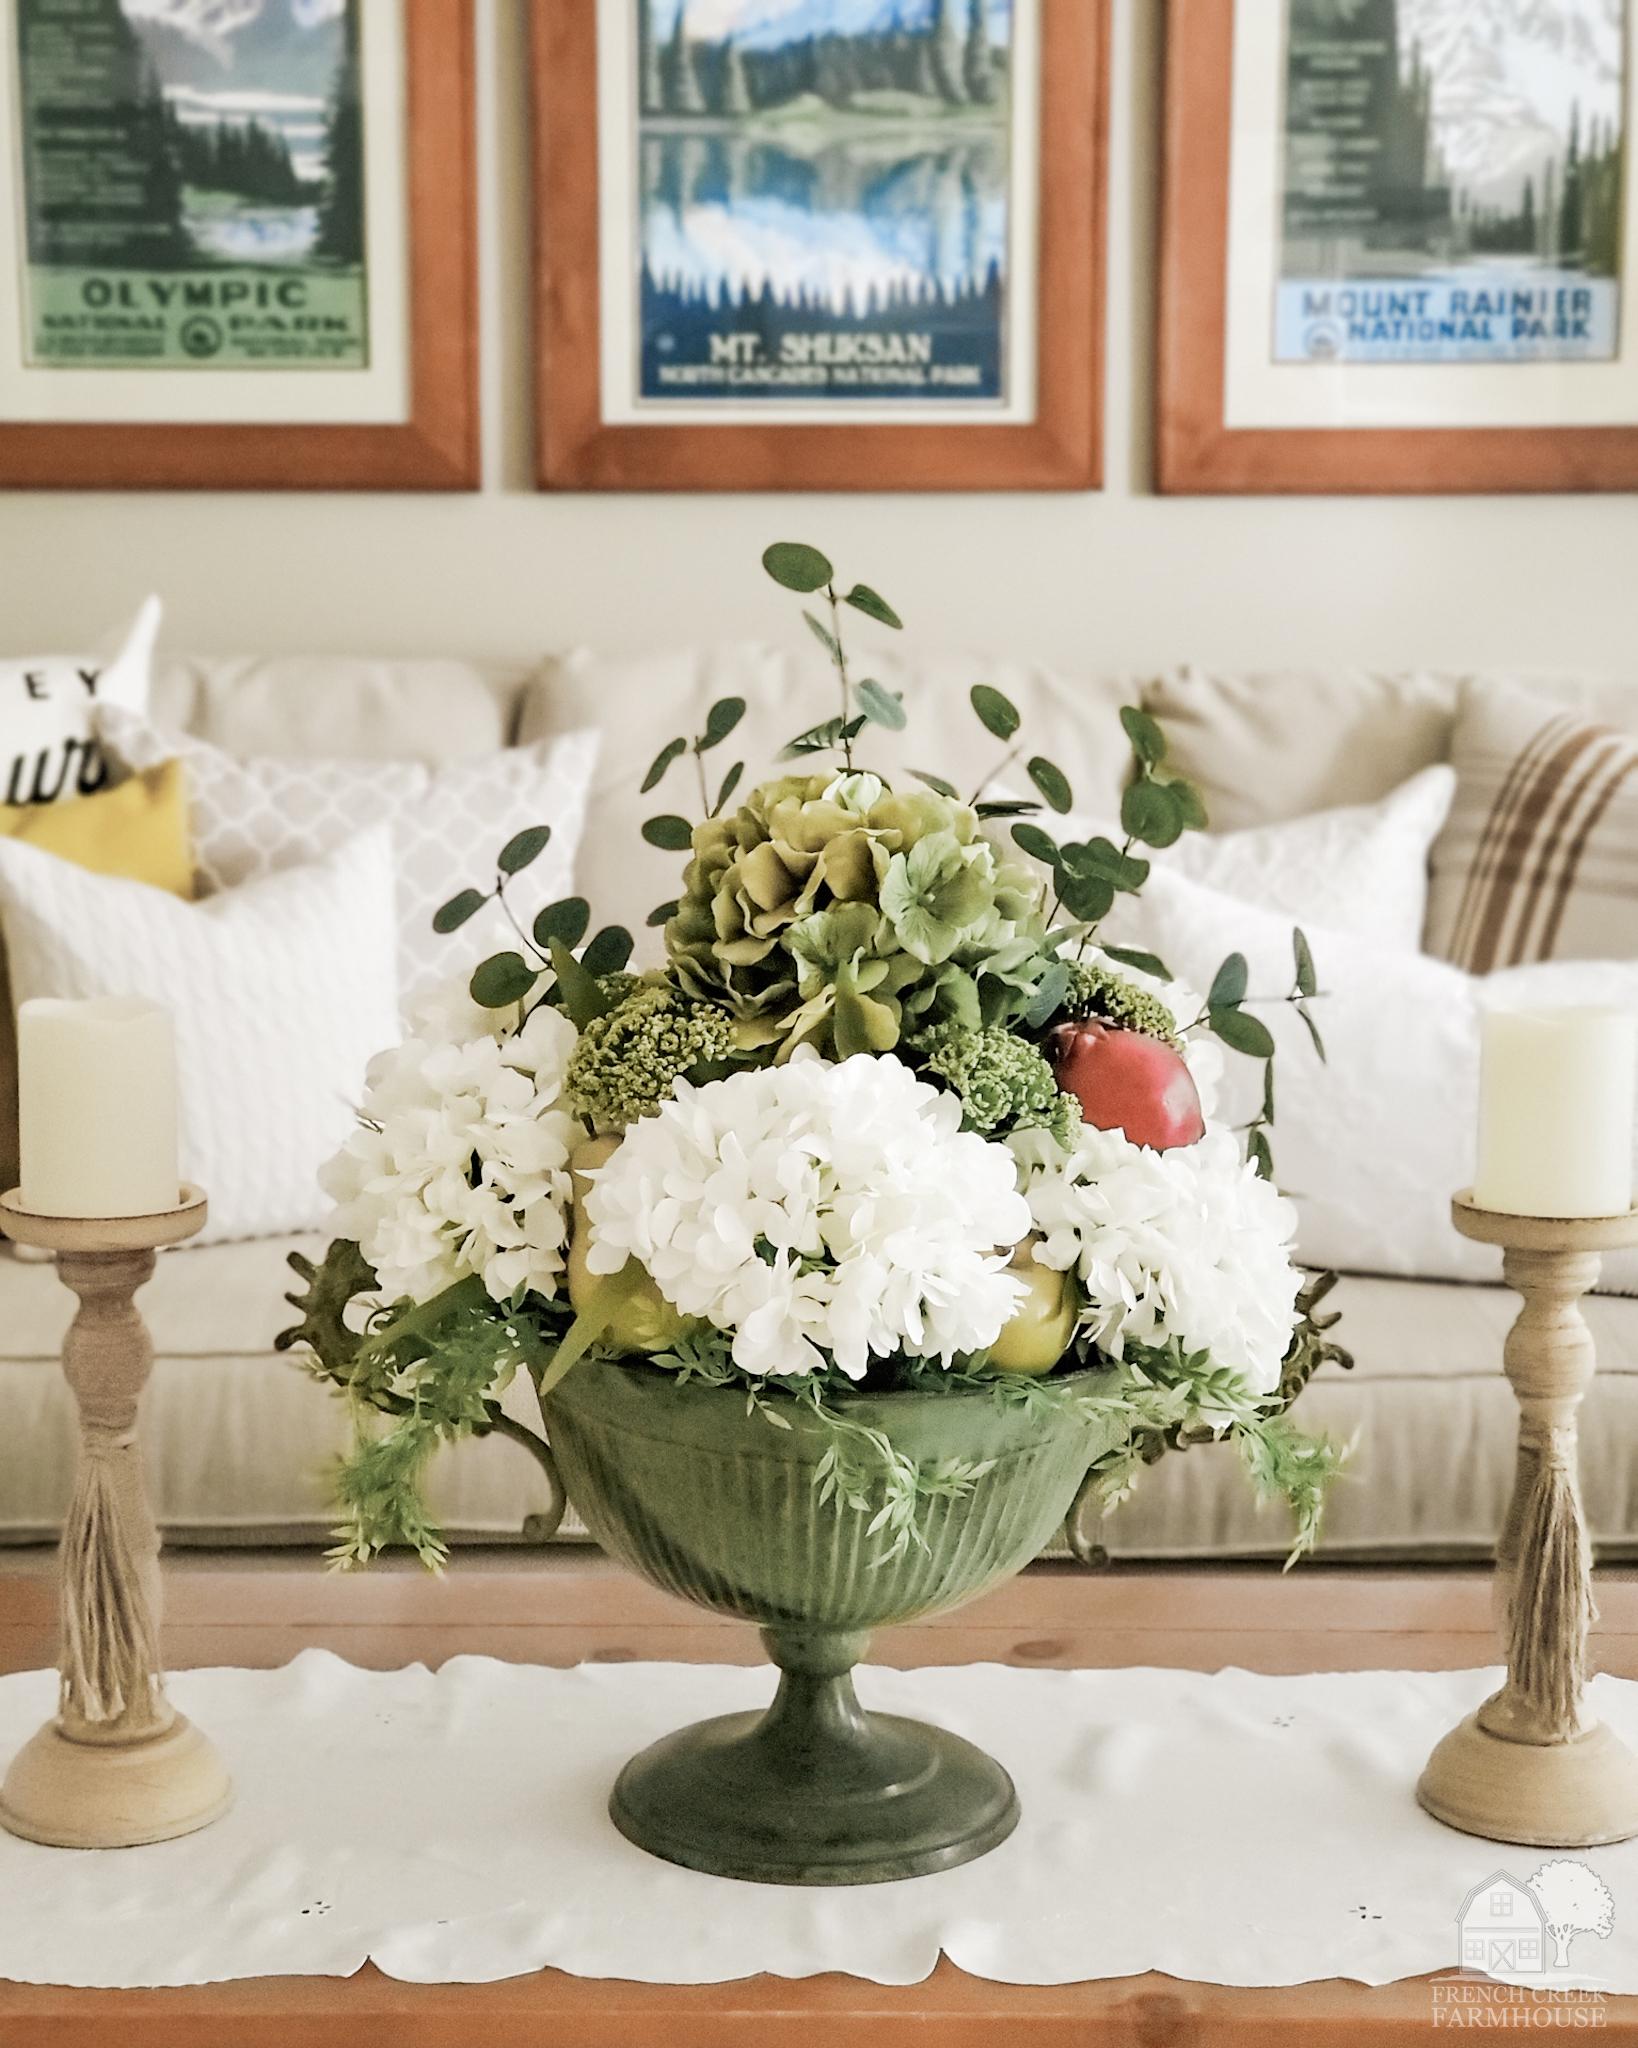 Creamy hydrangeas fill a vintage pedestal bowl